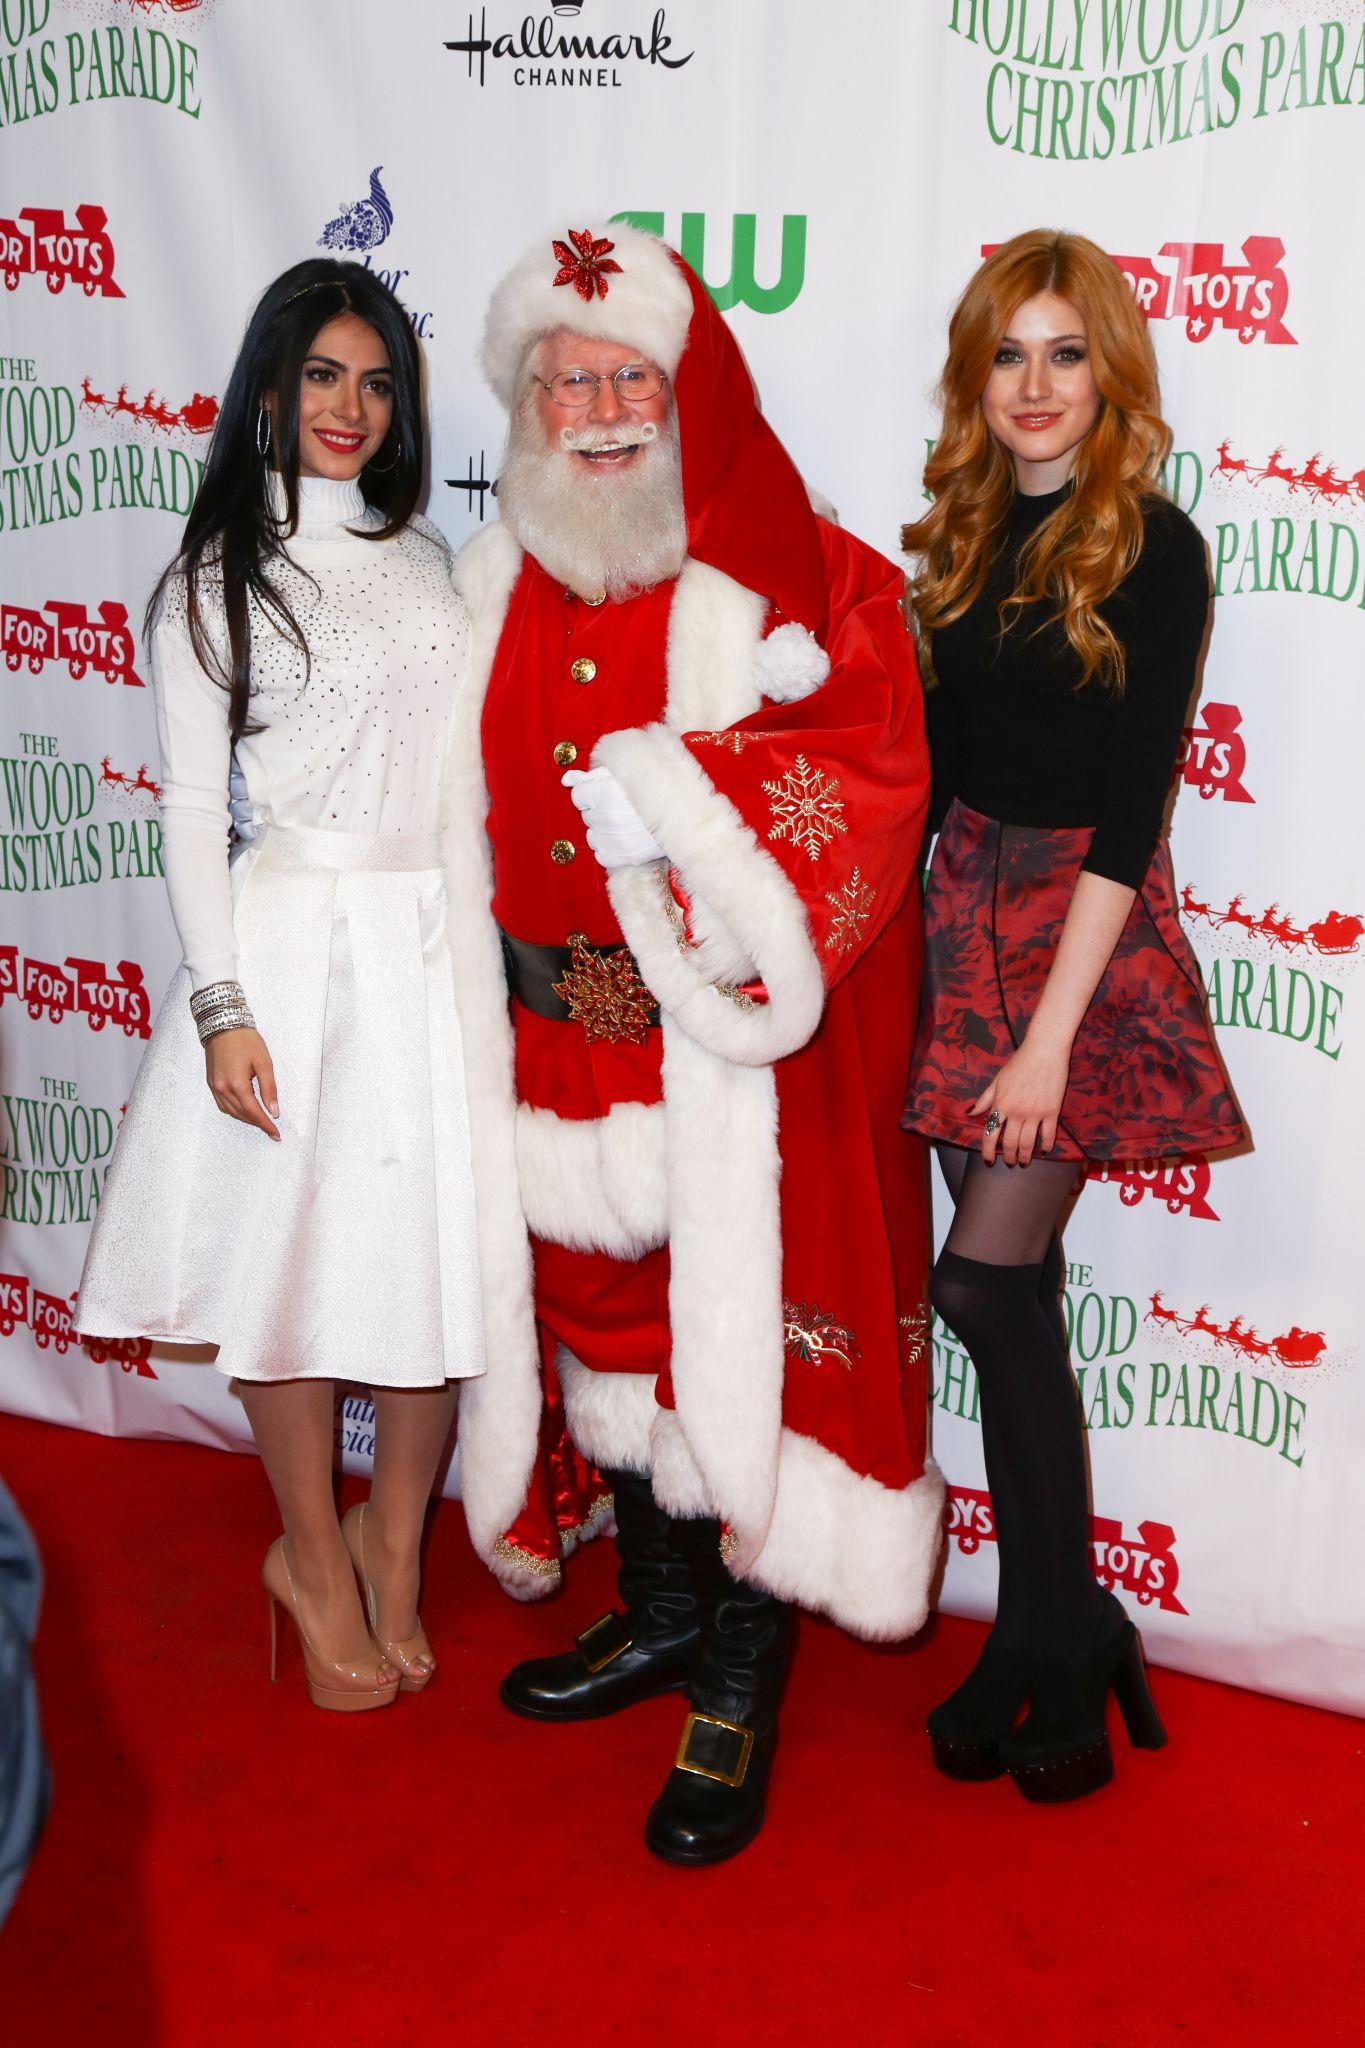 The Christmas Parade Hallmark.2015 Hollywood Christmas Parade November 29 2015